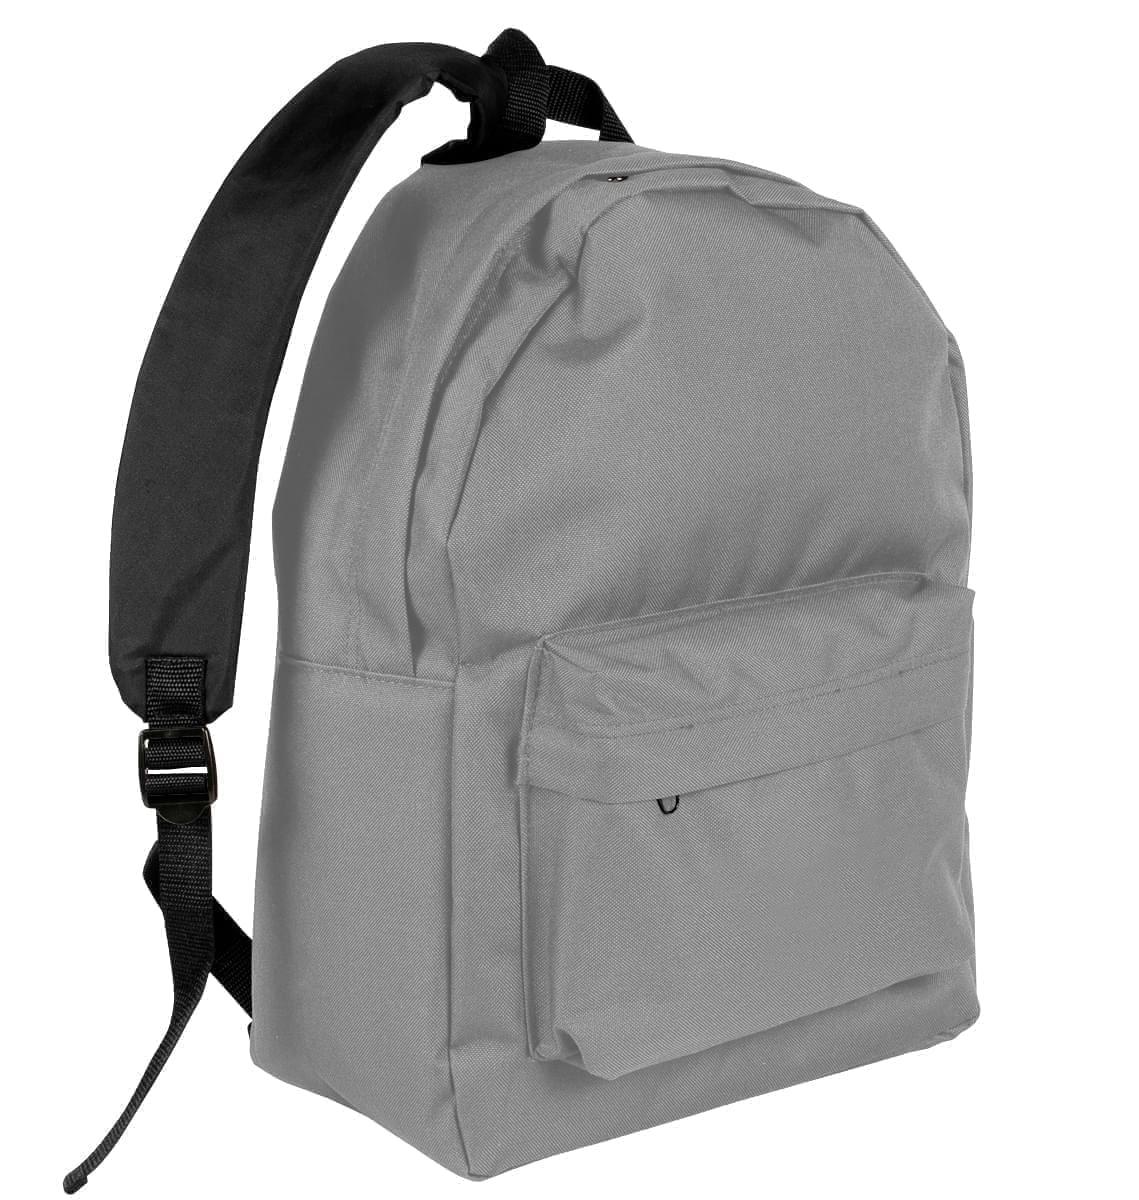 USA Made Nylon Poly Backpack Knapsacks, Grey-Black, 8960-A1R